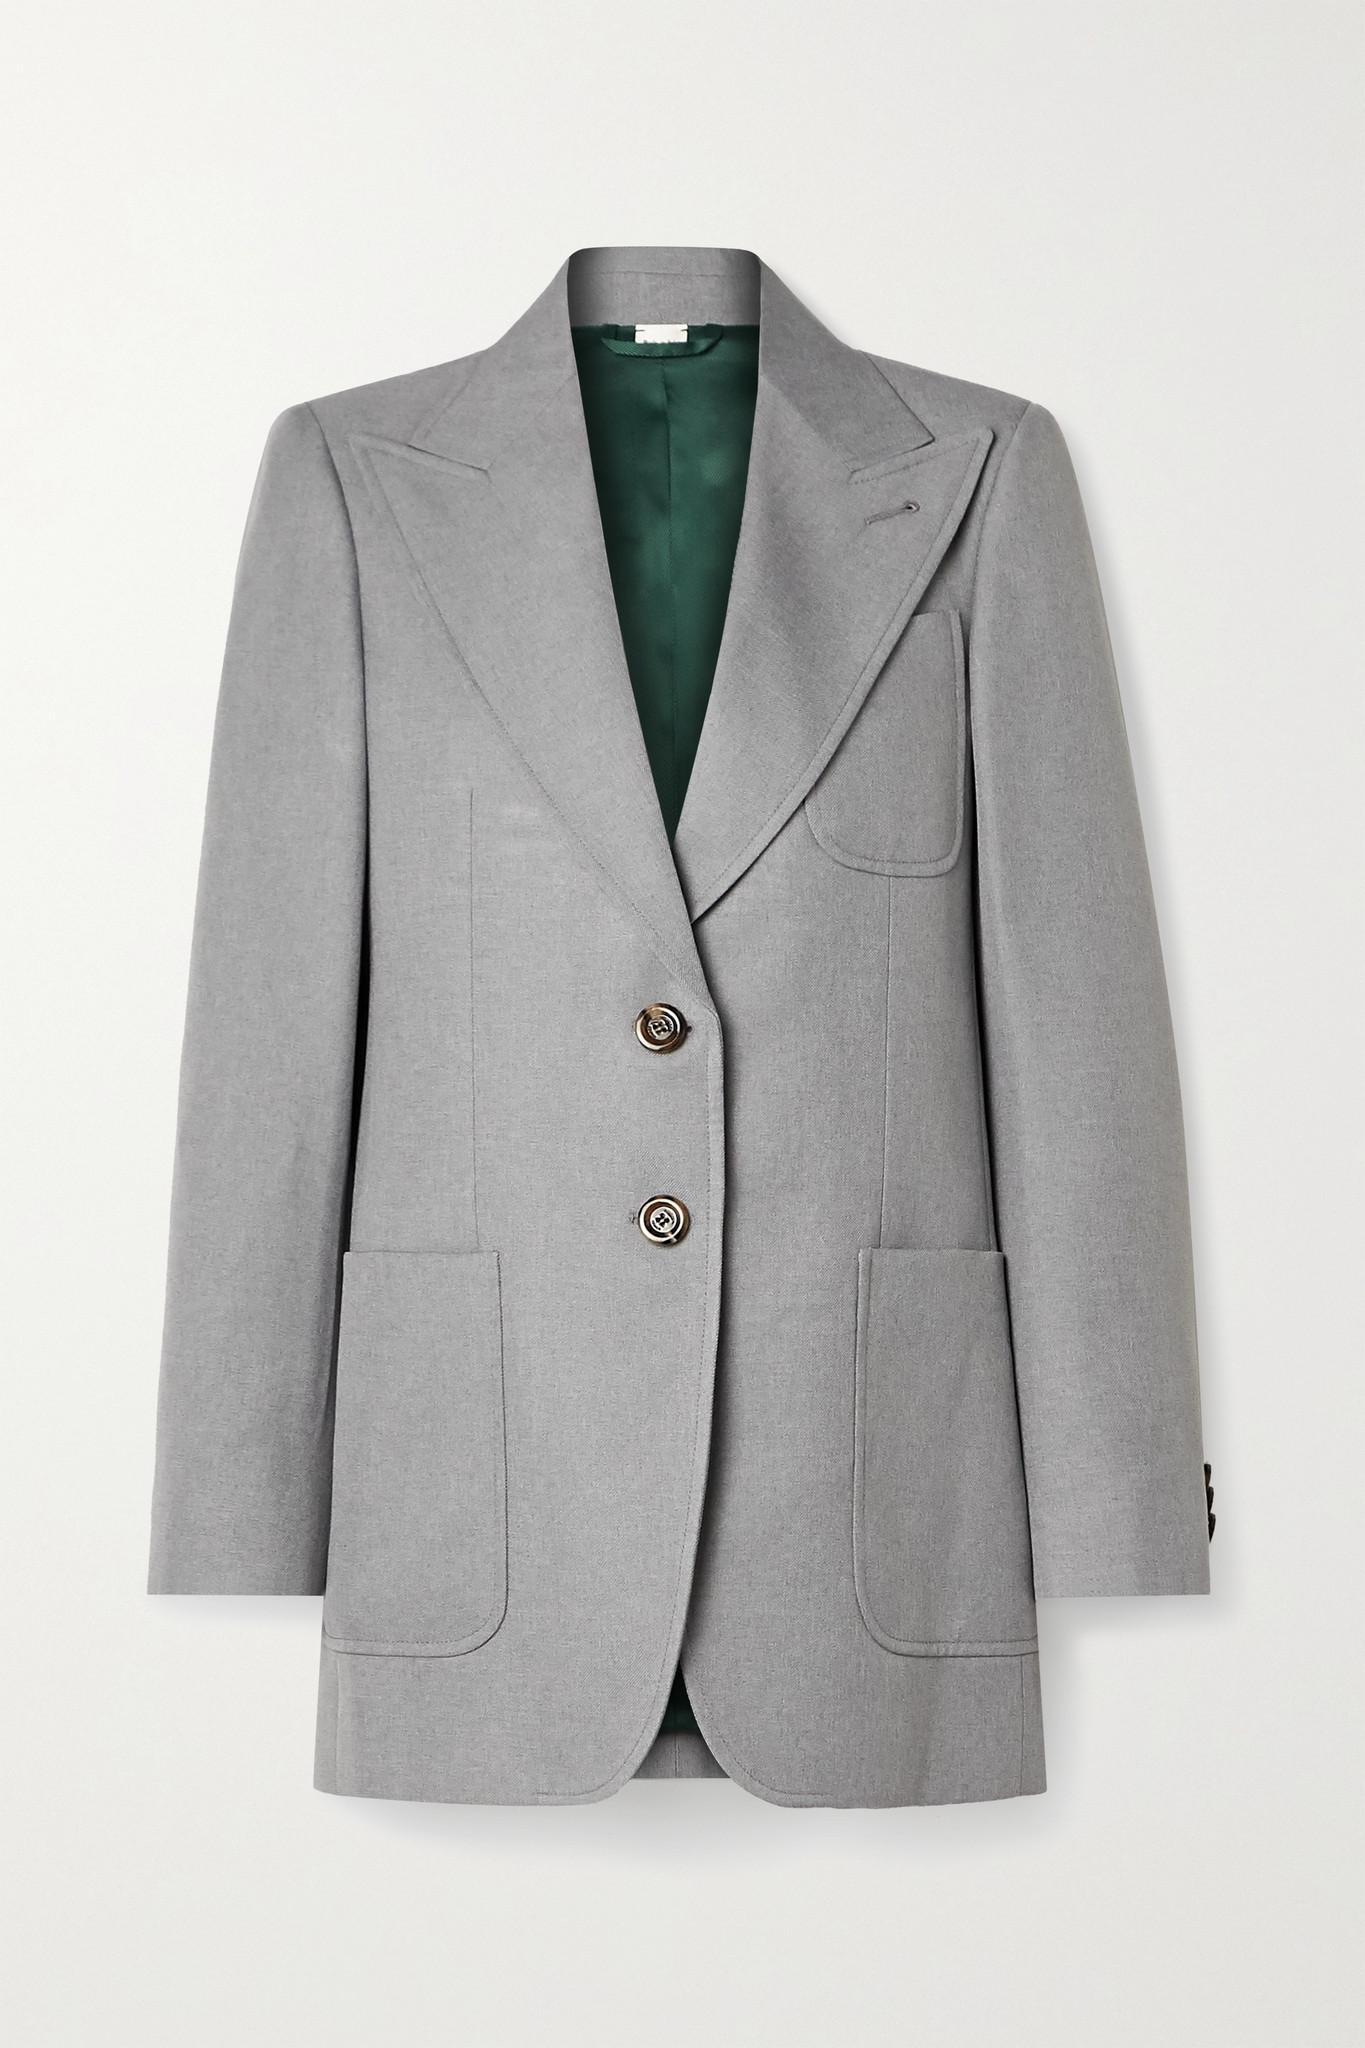 GUCCI - Oversized Woven Blazer - Gray - IT40